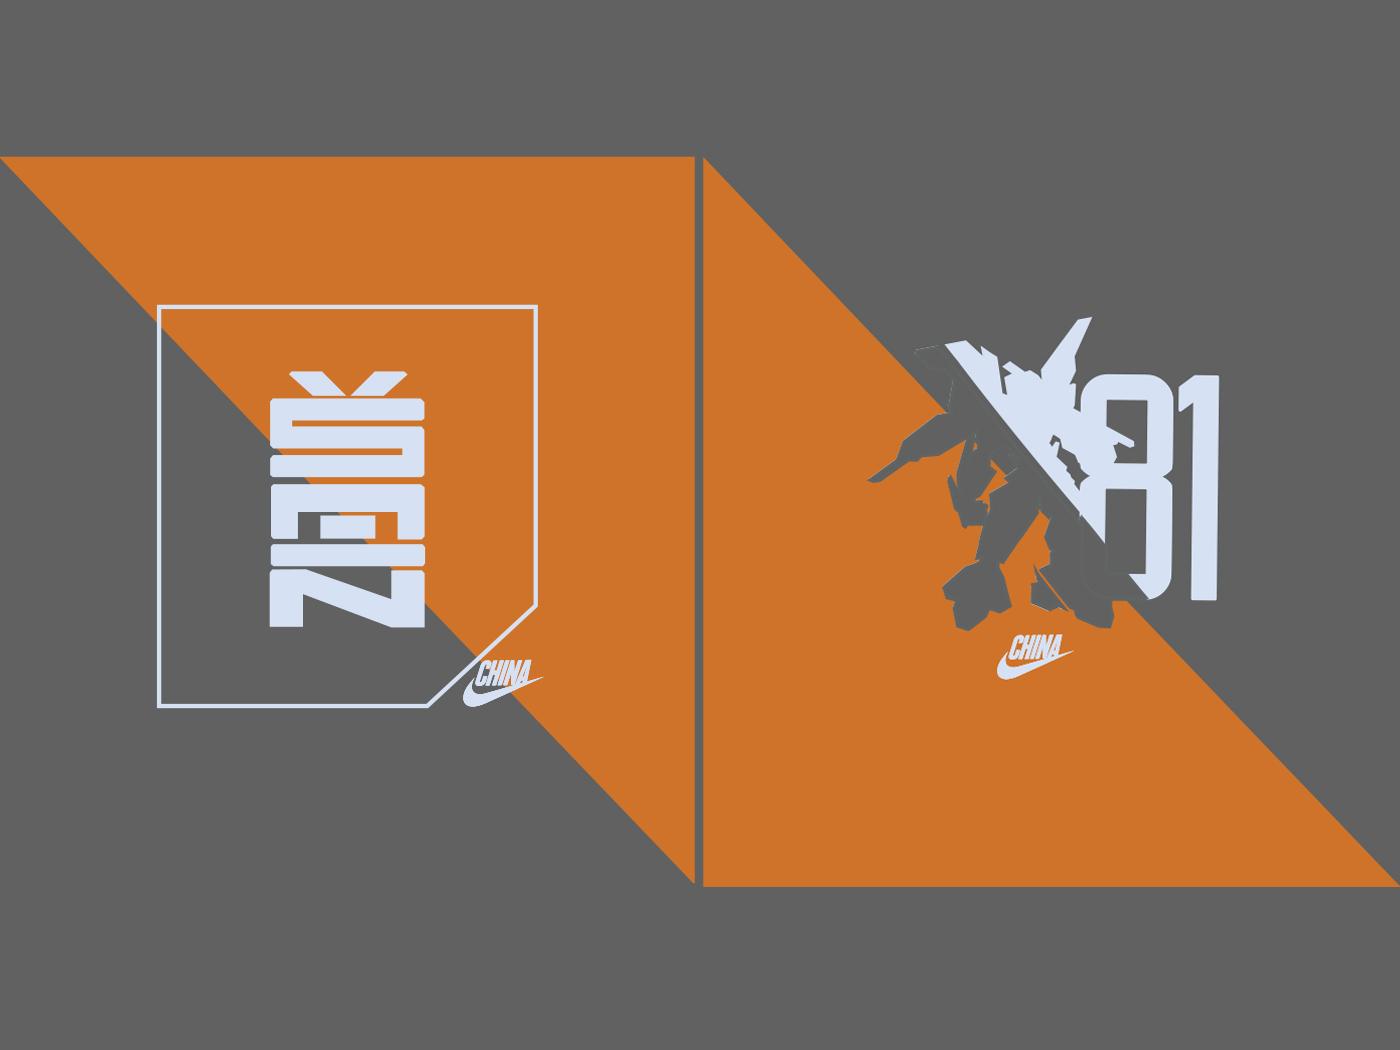 San Logo 81 san style print branding vector logo design